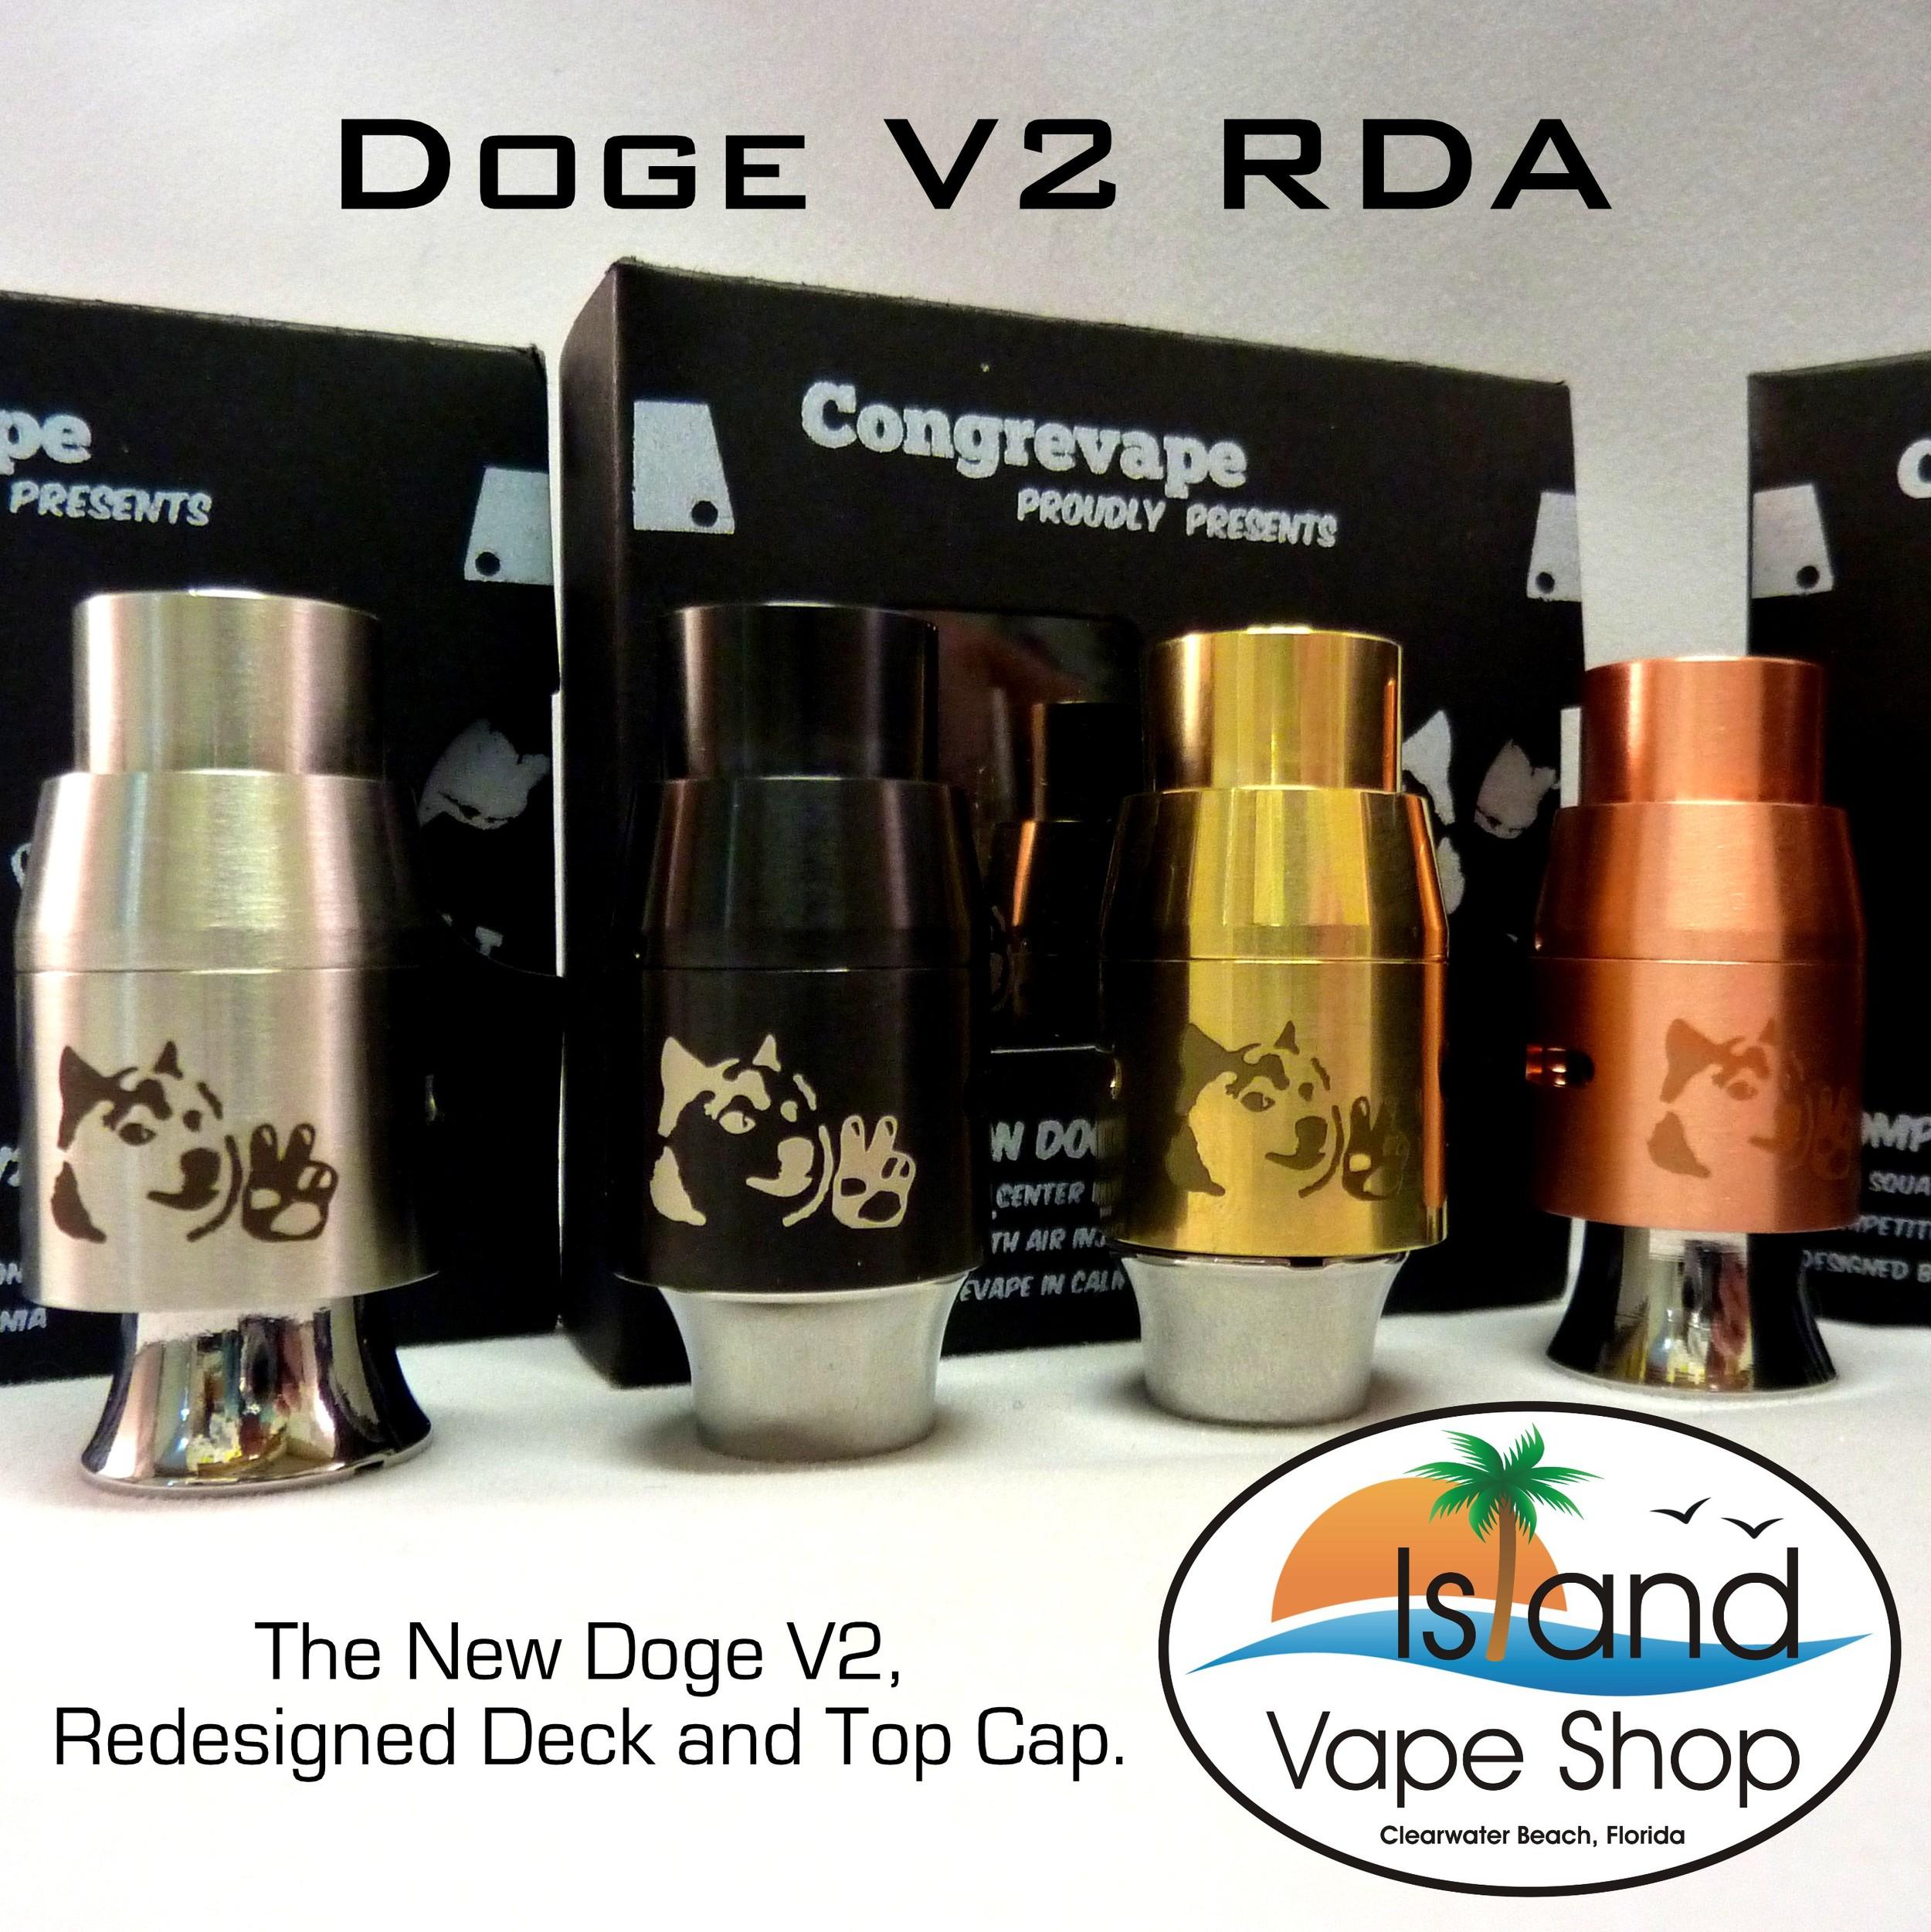 island_vape_shop_doge_congrevape_competition_v2_rba_black_brass_silver_copper_NEW.jpg